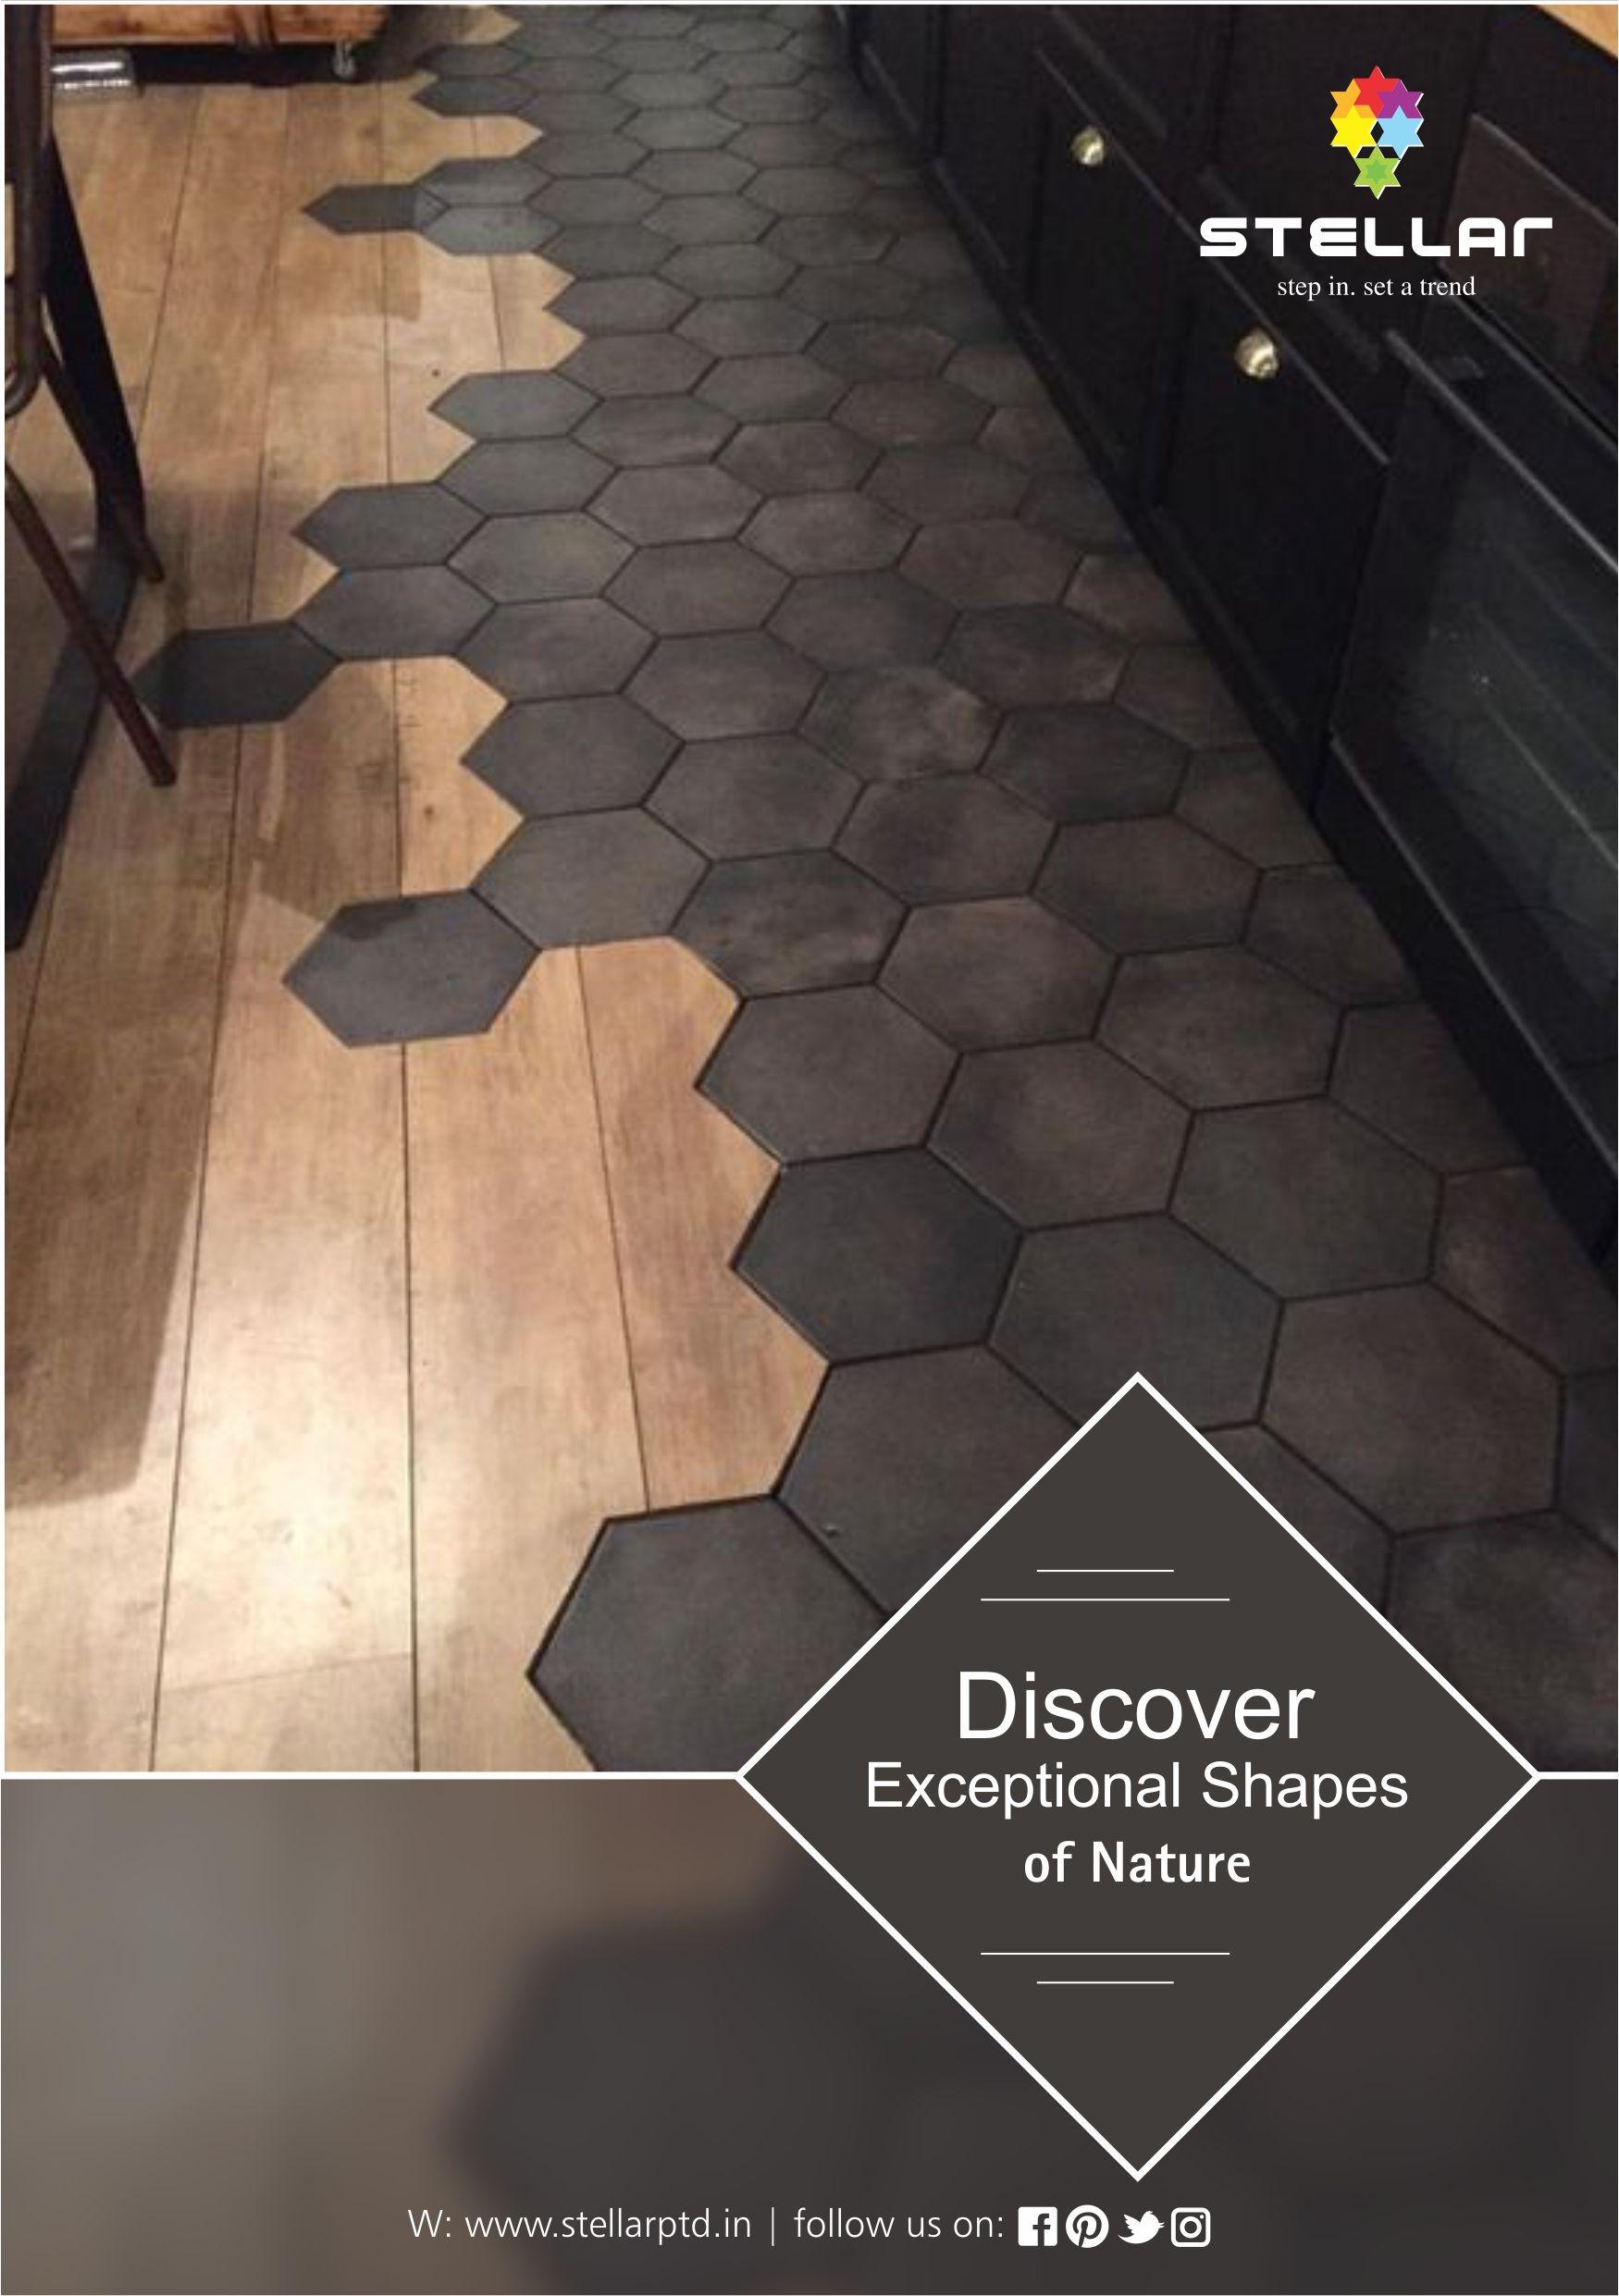 Discover Flooring Concepts Beyond Tiles And Ceramics Stellar Located At Hyderabad Stellarhomedecor Showcases Exclusiveh Decorative Panels Veneers Laminates